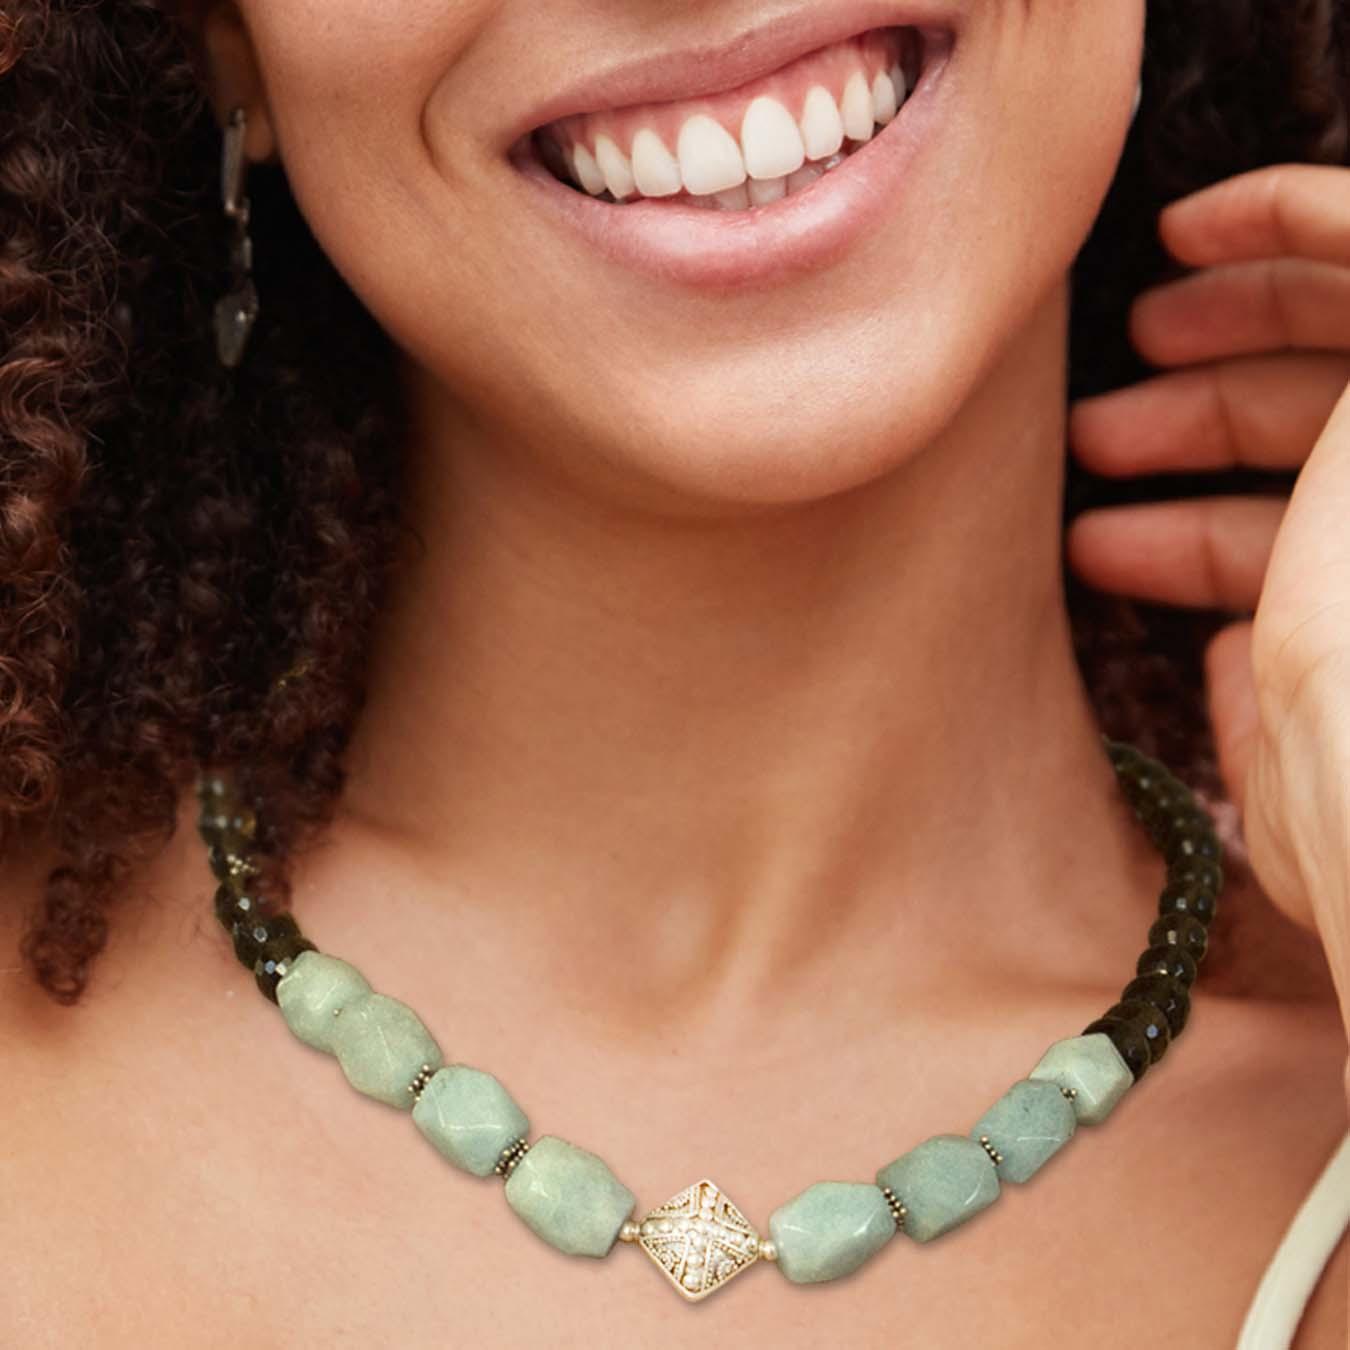 Aquamarine and smoky quartz handmade jewelry necklace with bali beads